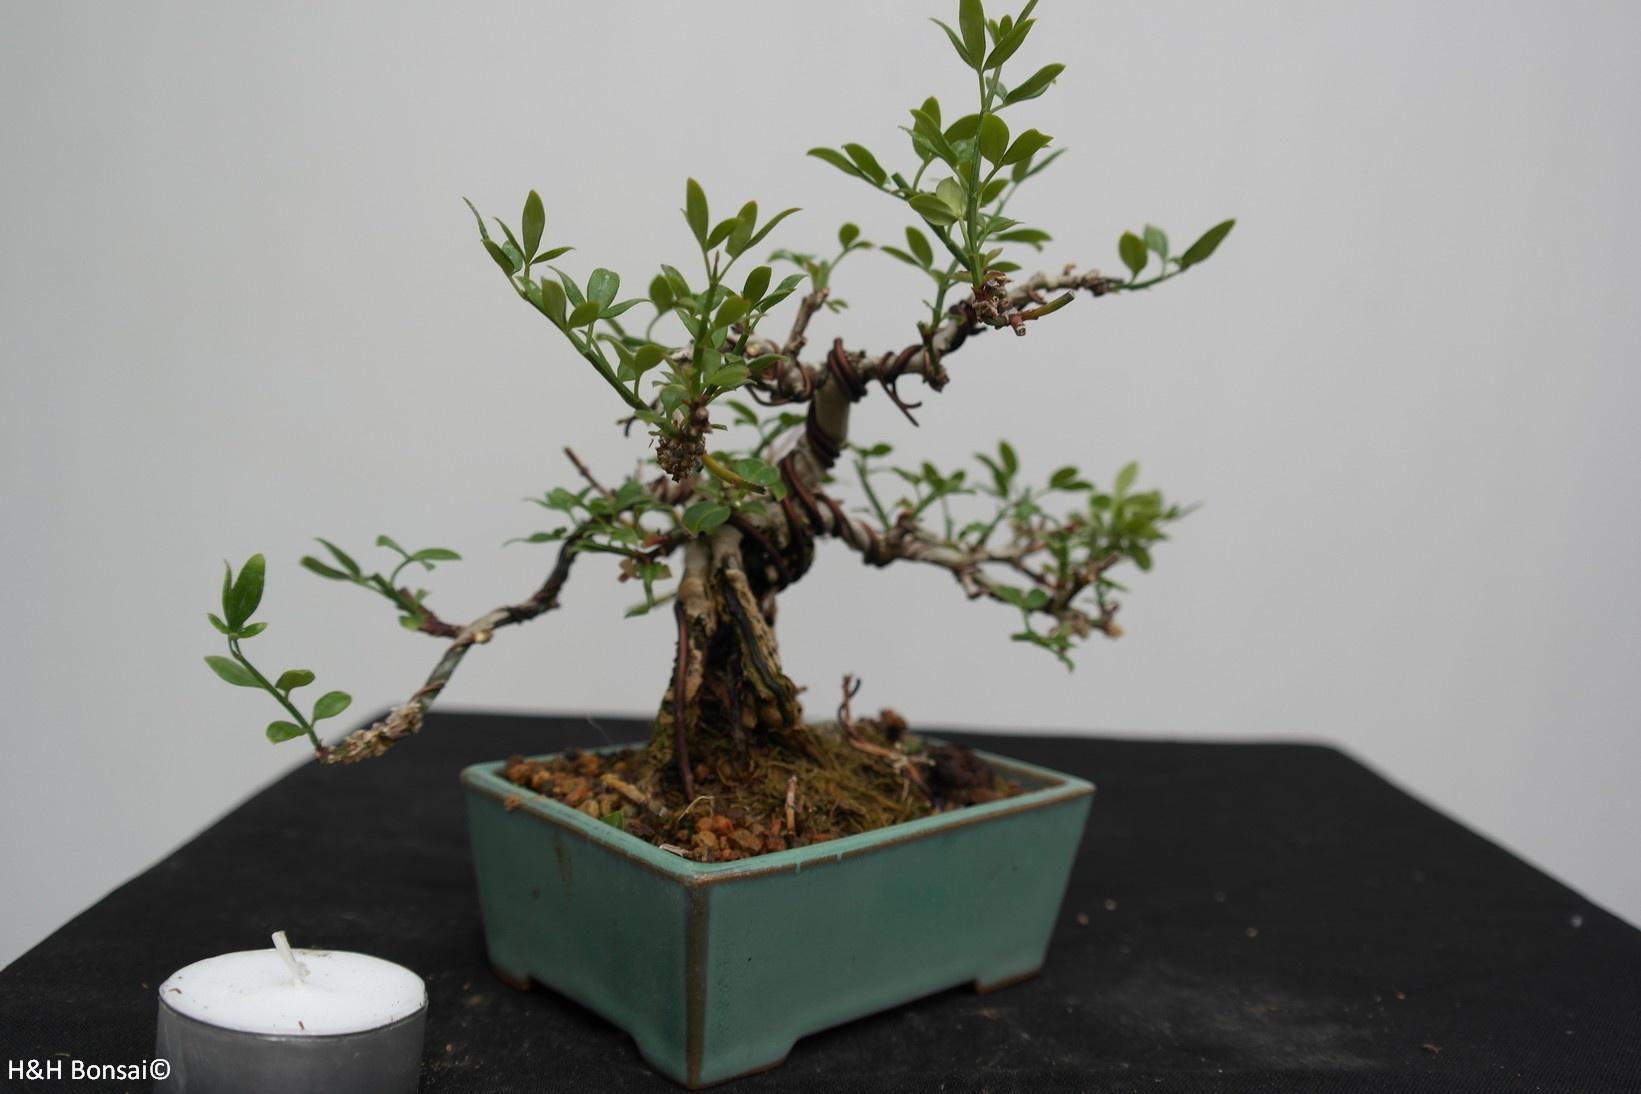 Bonsai ShohinWinter jasmine, Jasminum nudiflorum, no. 7528